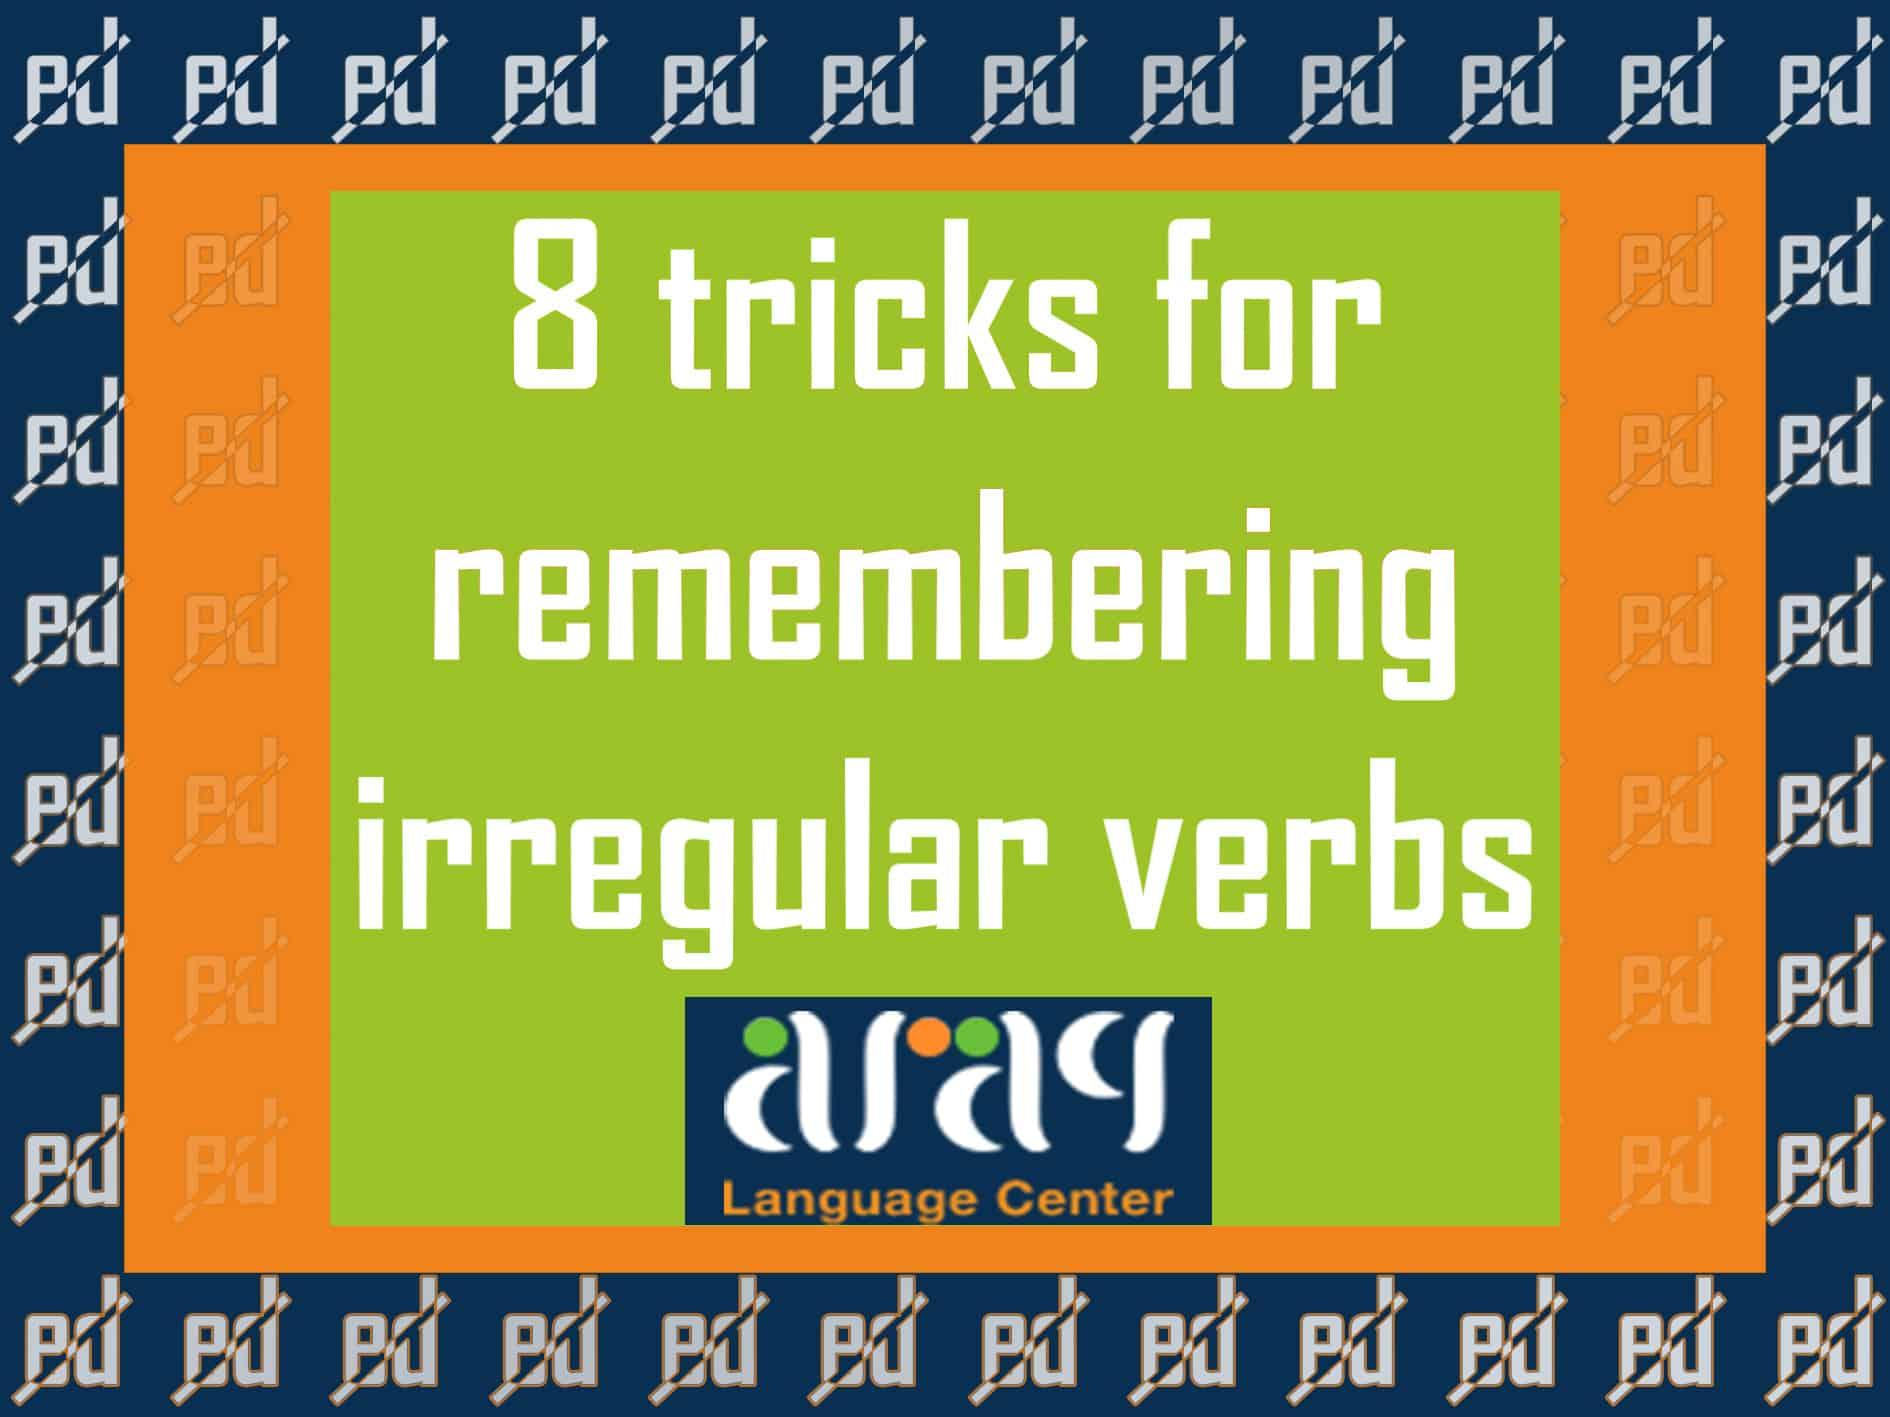 8 tricks for remembering irregular verbs